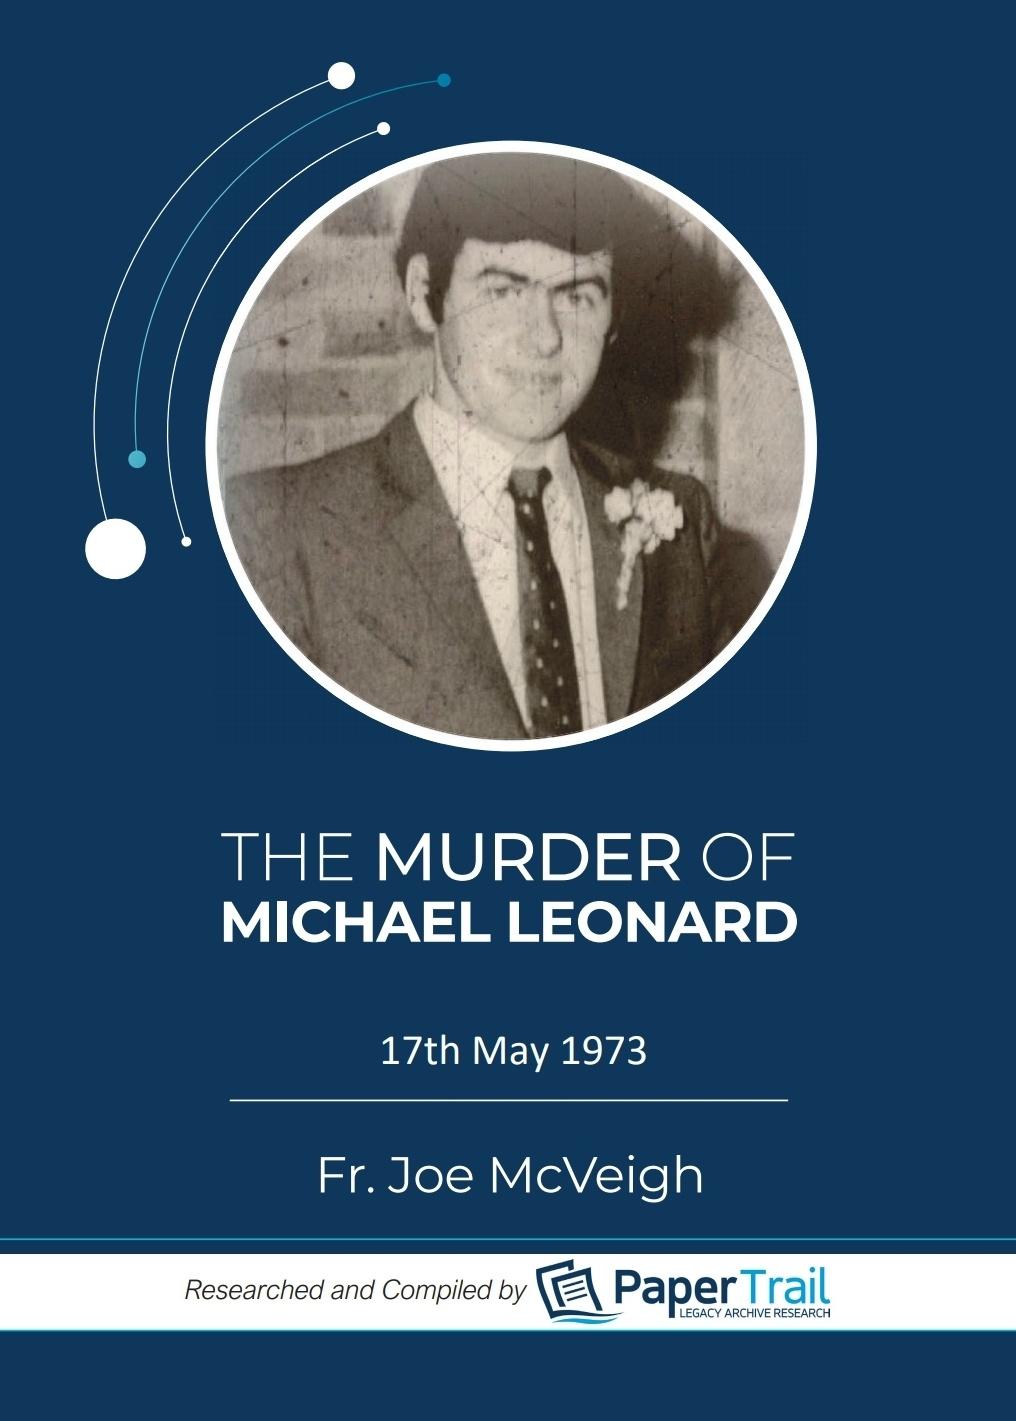 The Murder of Michael Leonard.